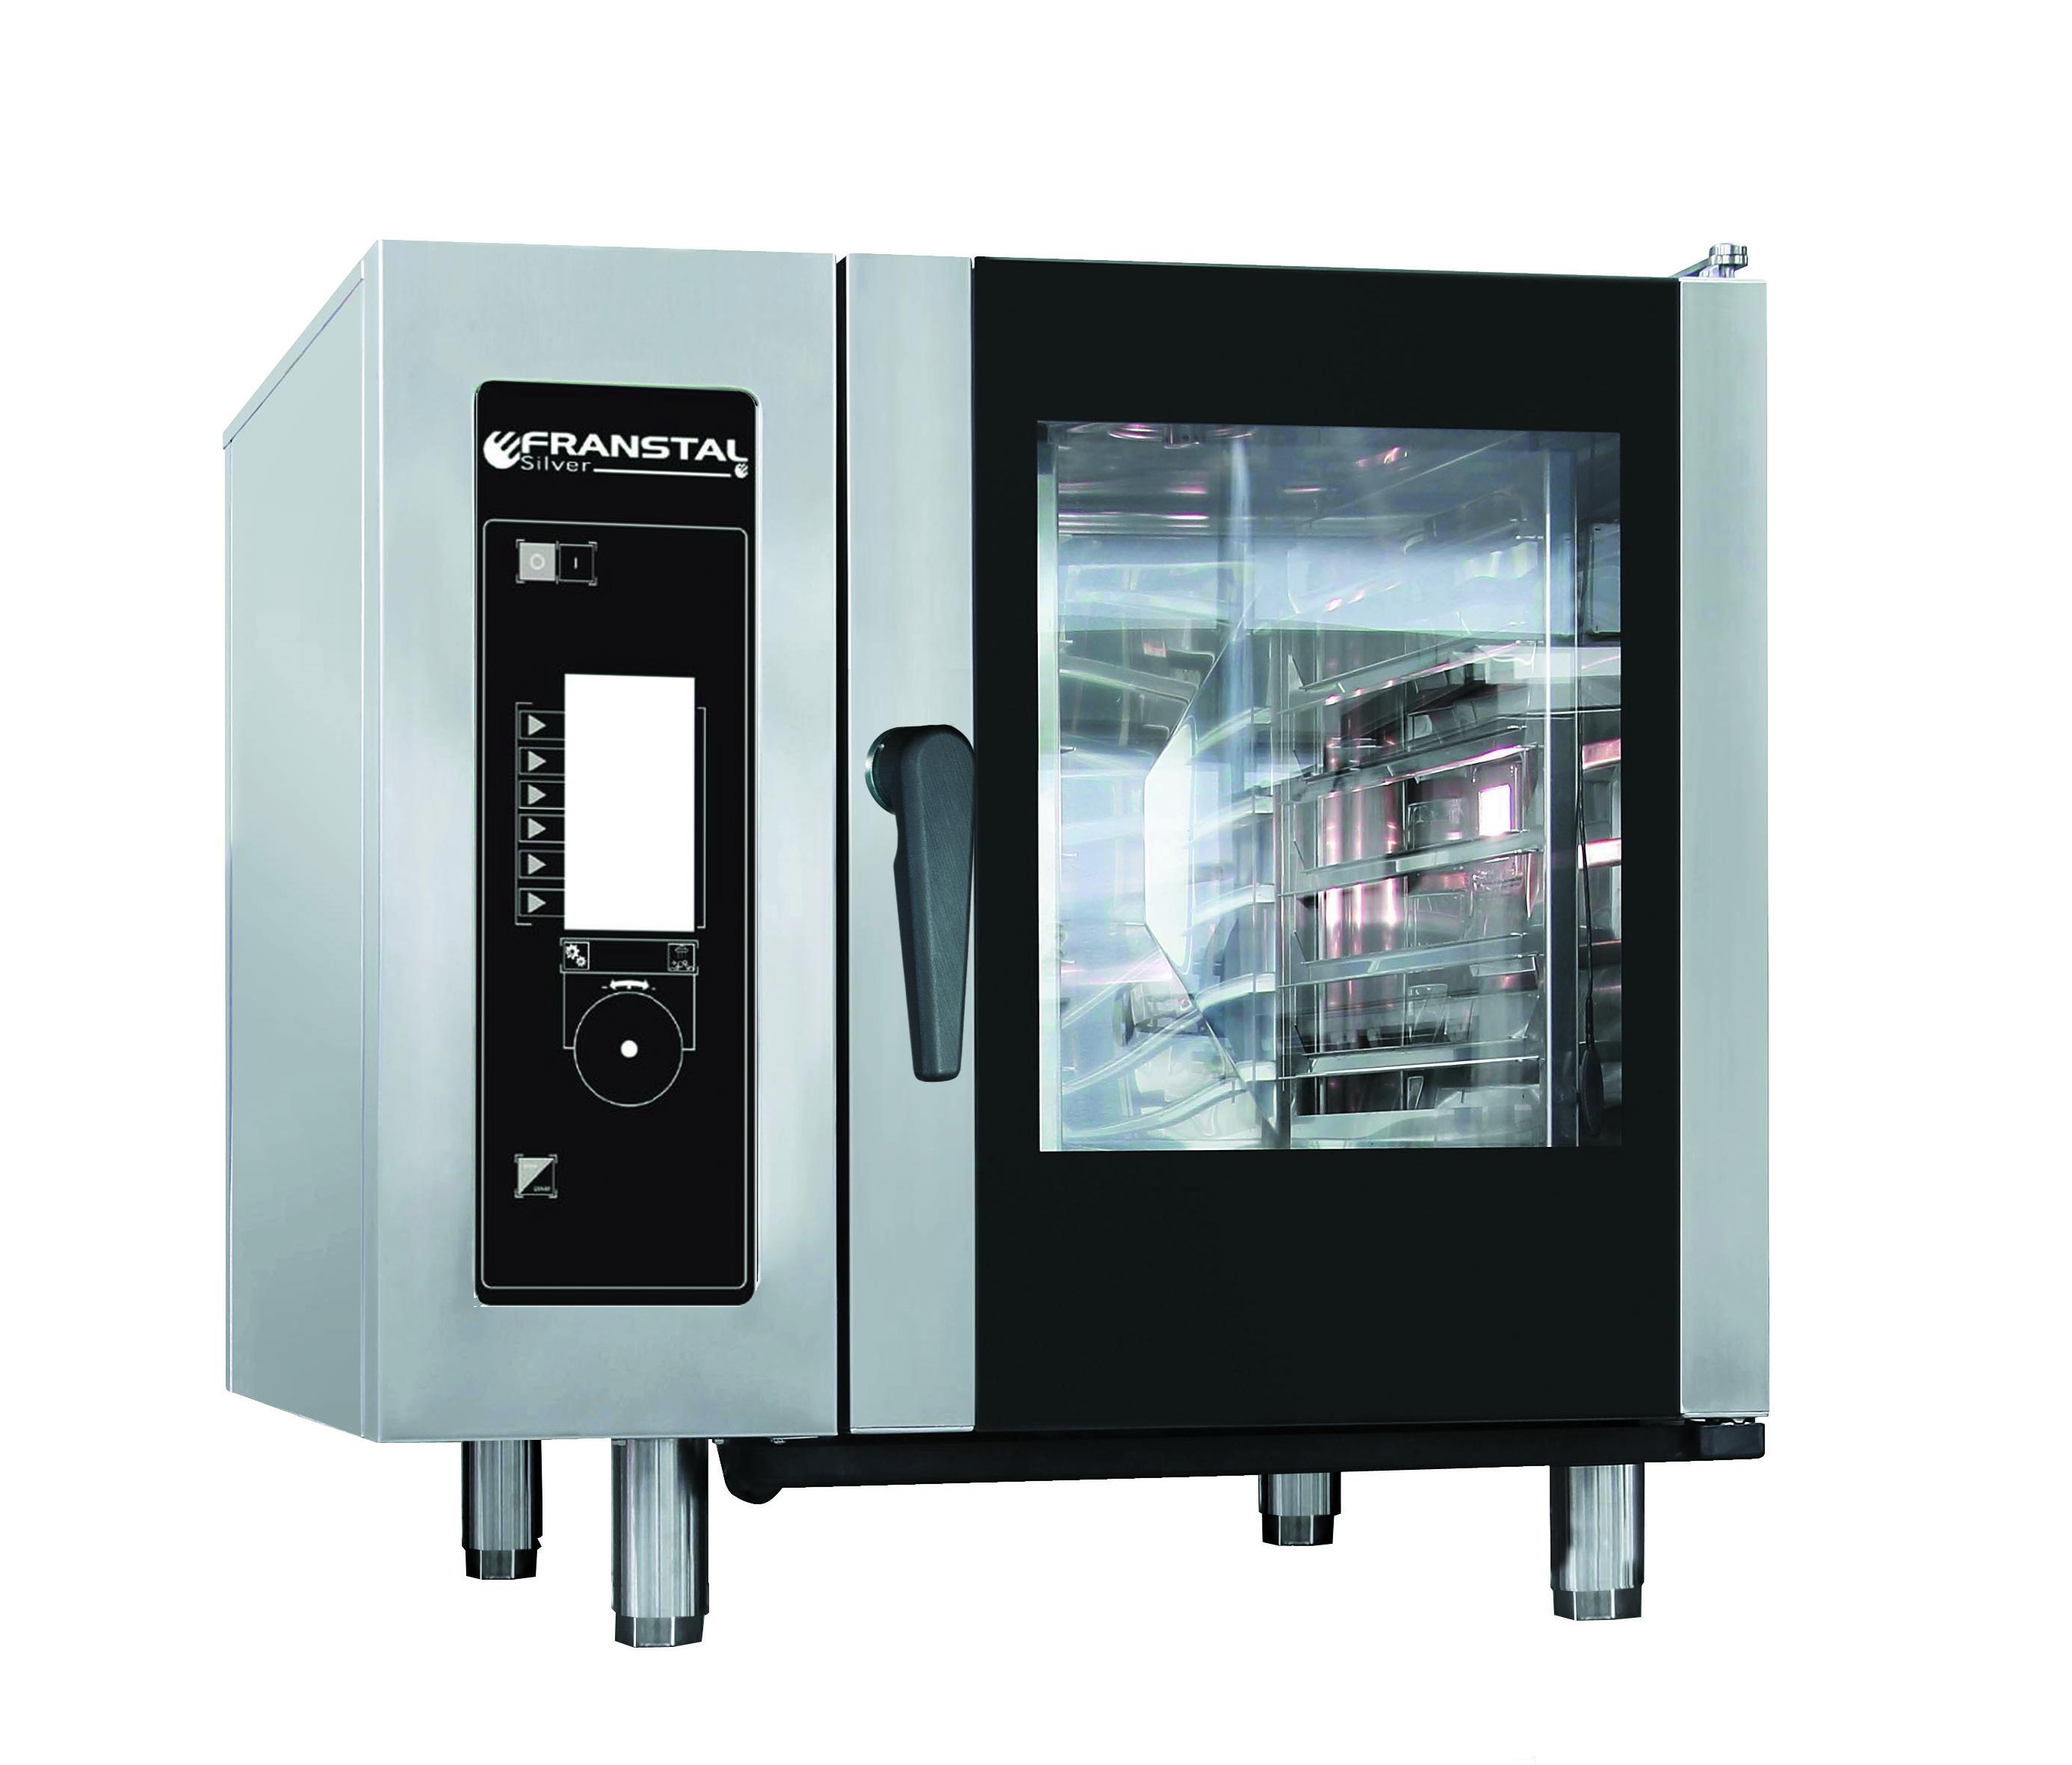 FOURS MIXTE FRE-061 400/230V 3N 50/60HZ